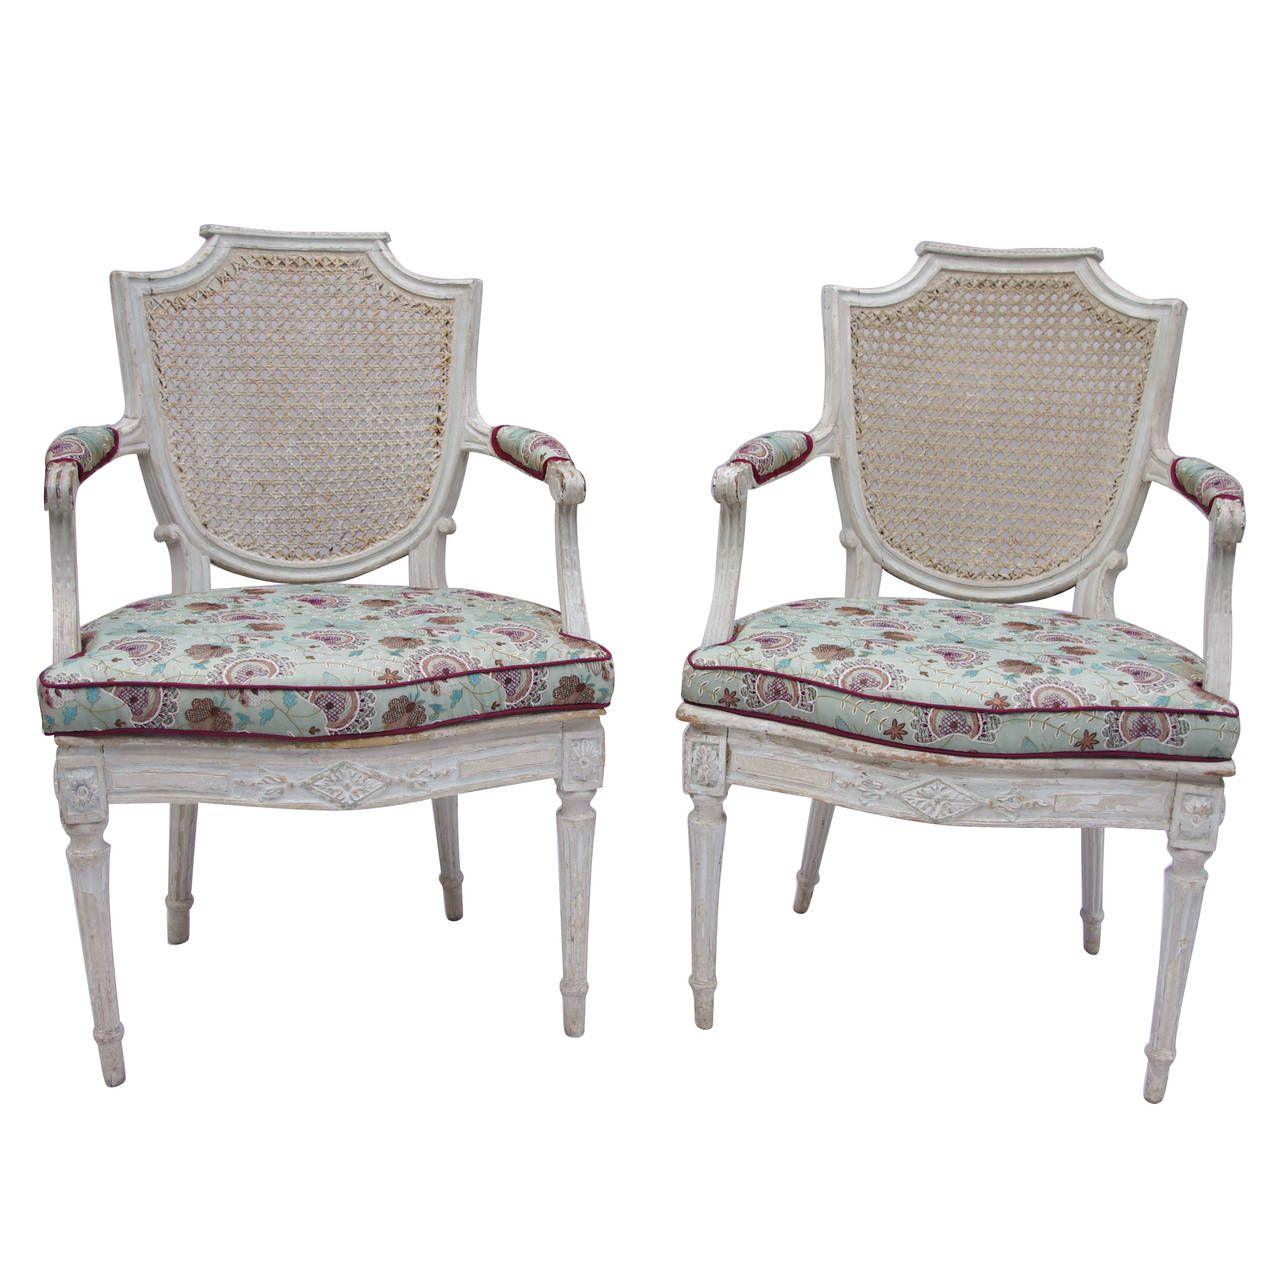 Pair of Louis XVI Period Armchairs 1